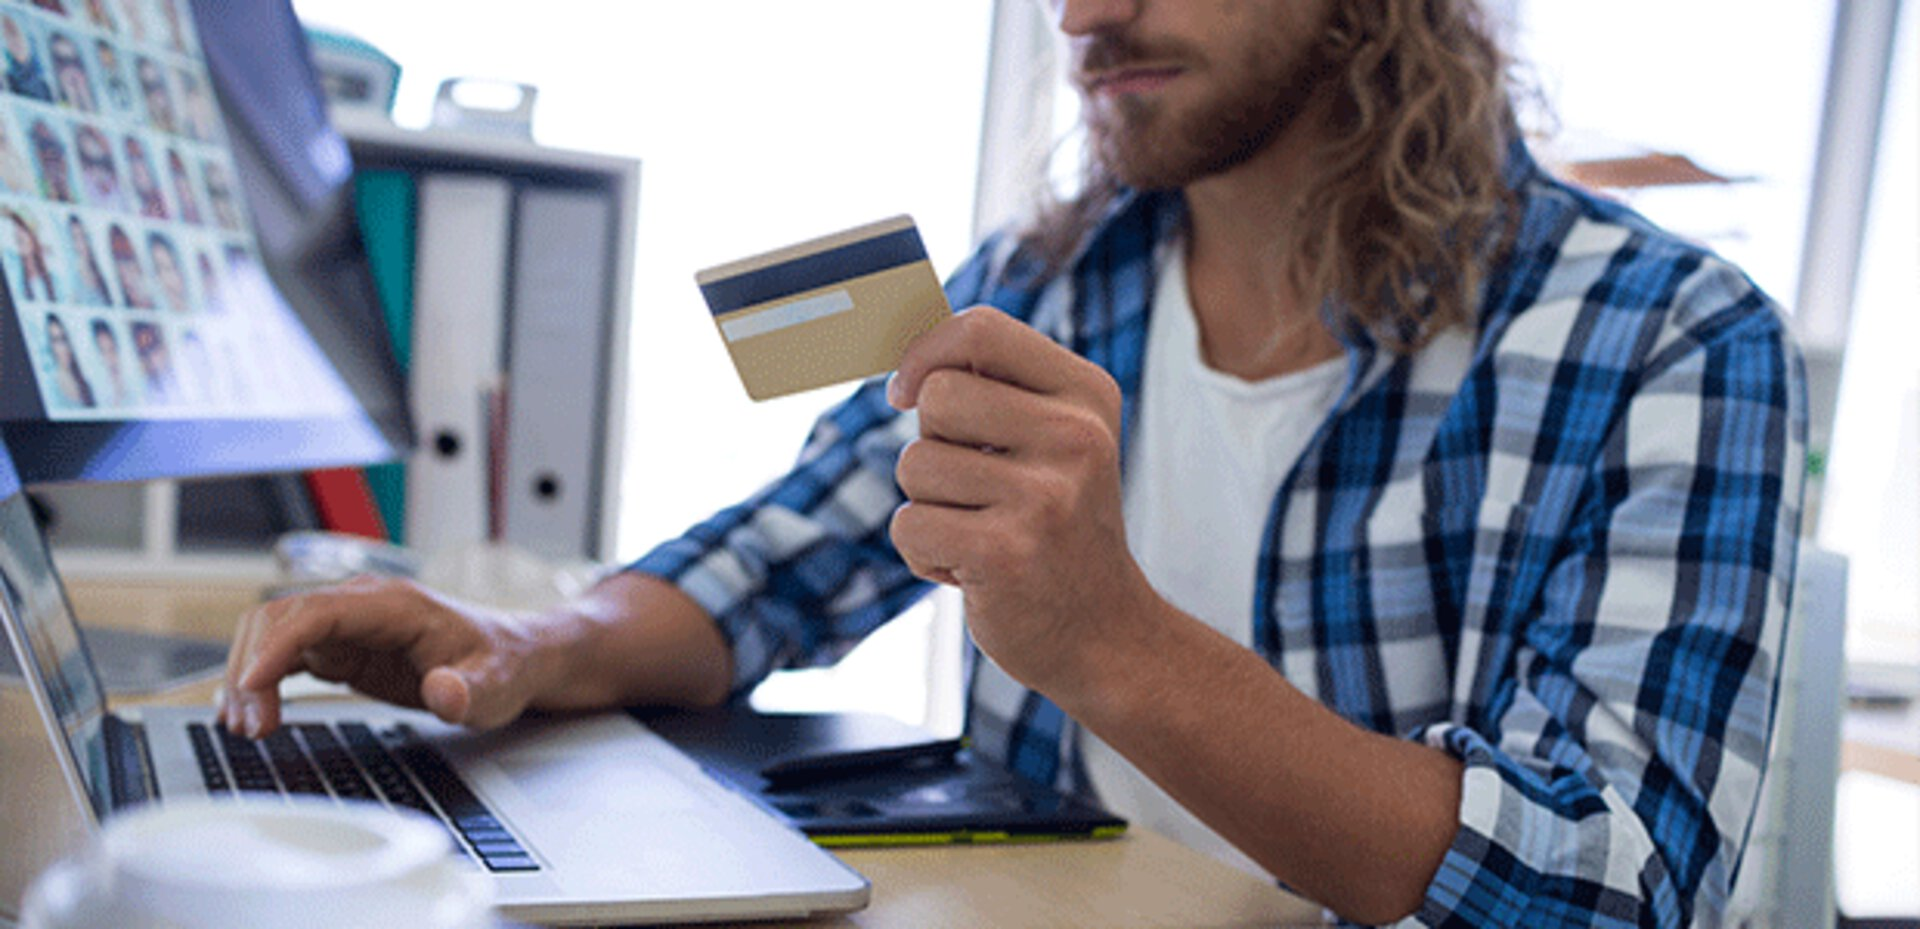 Ausbildung als E-Commerce Fachkraft bei Möbel Inhofer